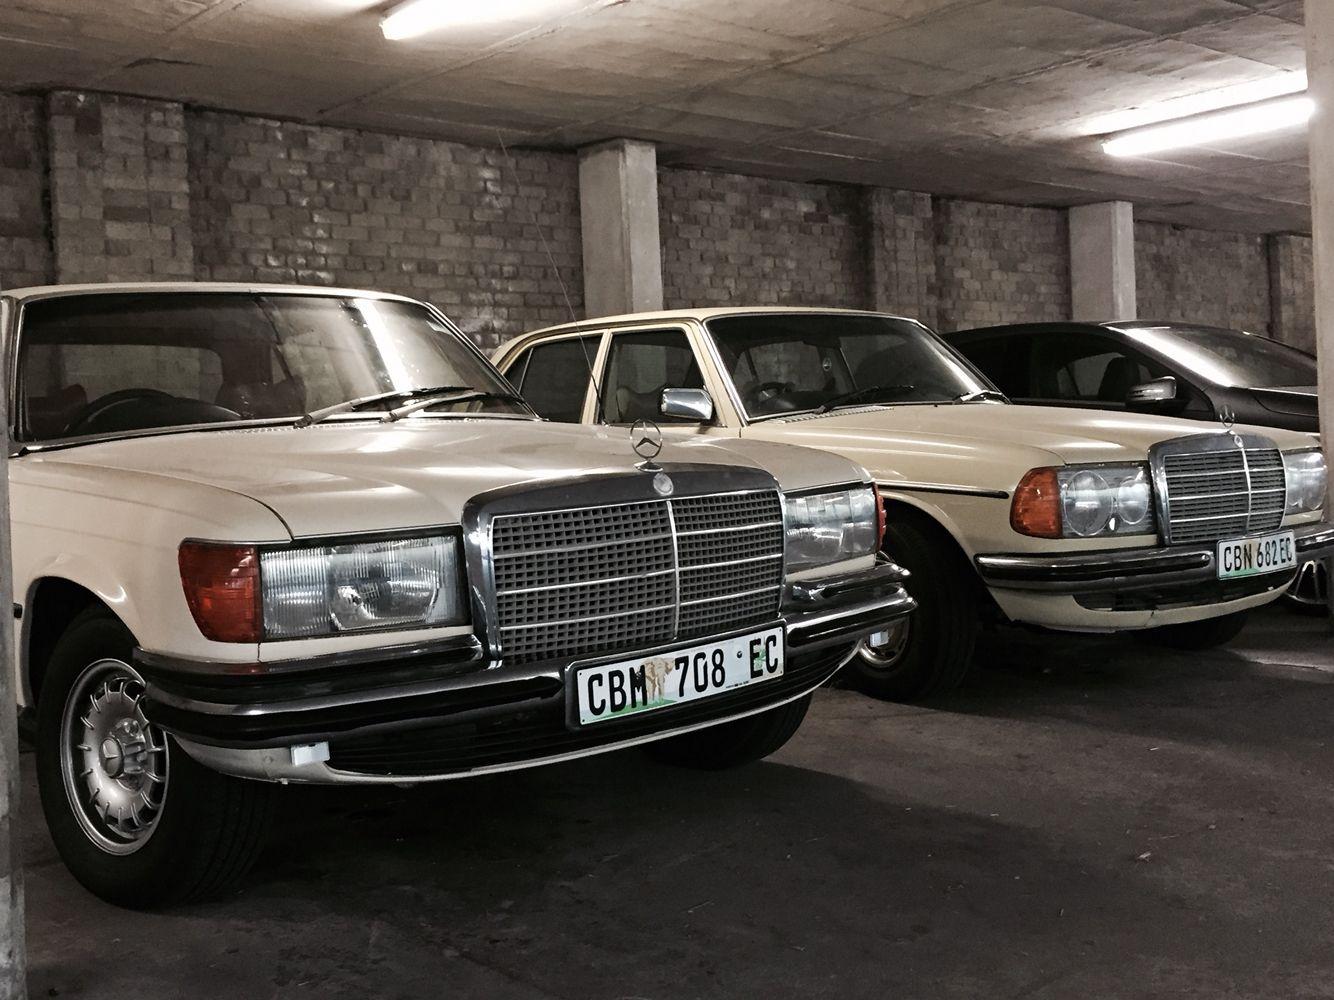 Mercedes W116 350se W123 240d With Images Mercedes Benz